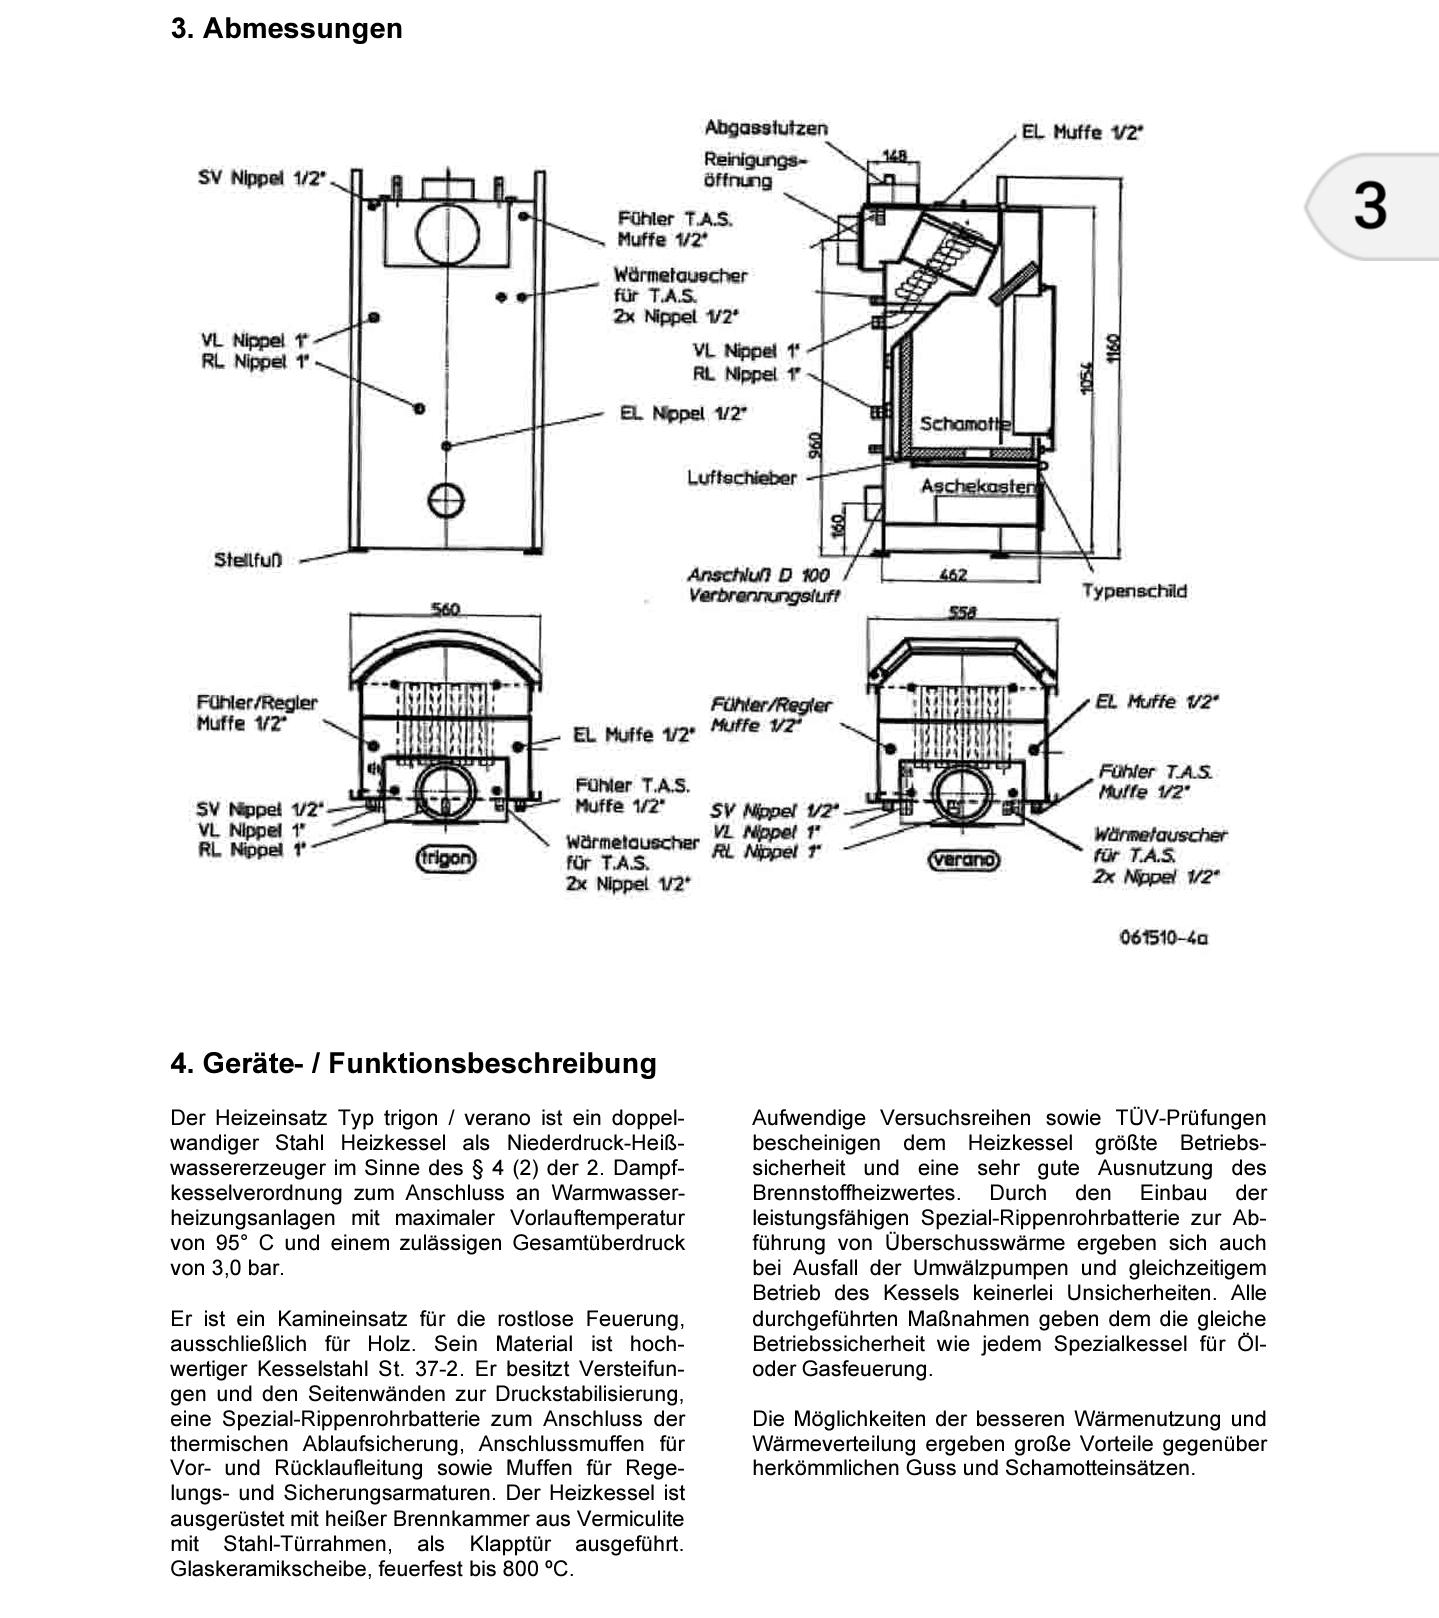 SBS Heizkessel: Ersatzteile Kaminofen Trigon/Verano Shop - 04283 ...